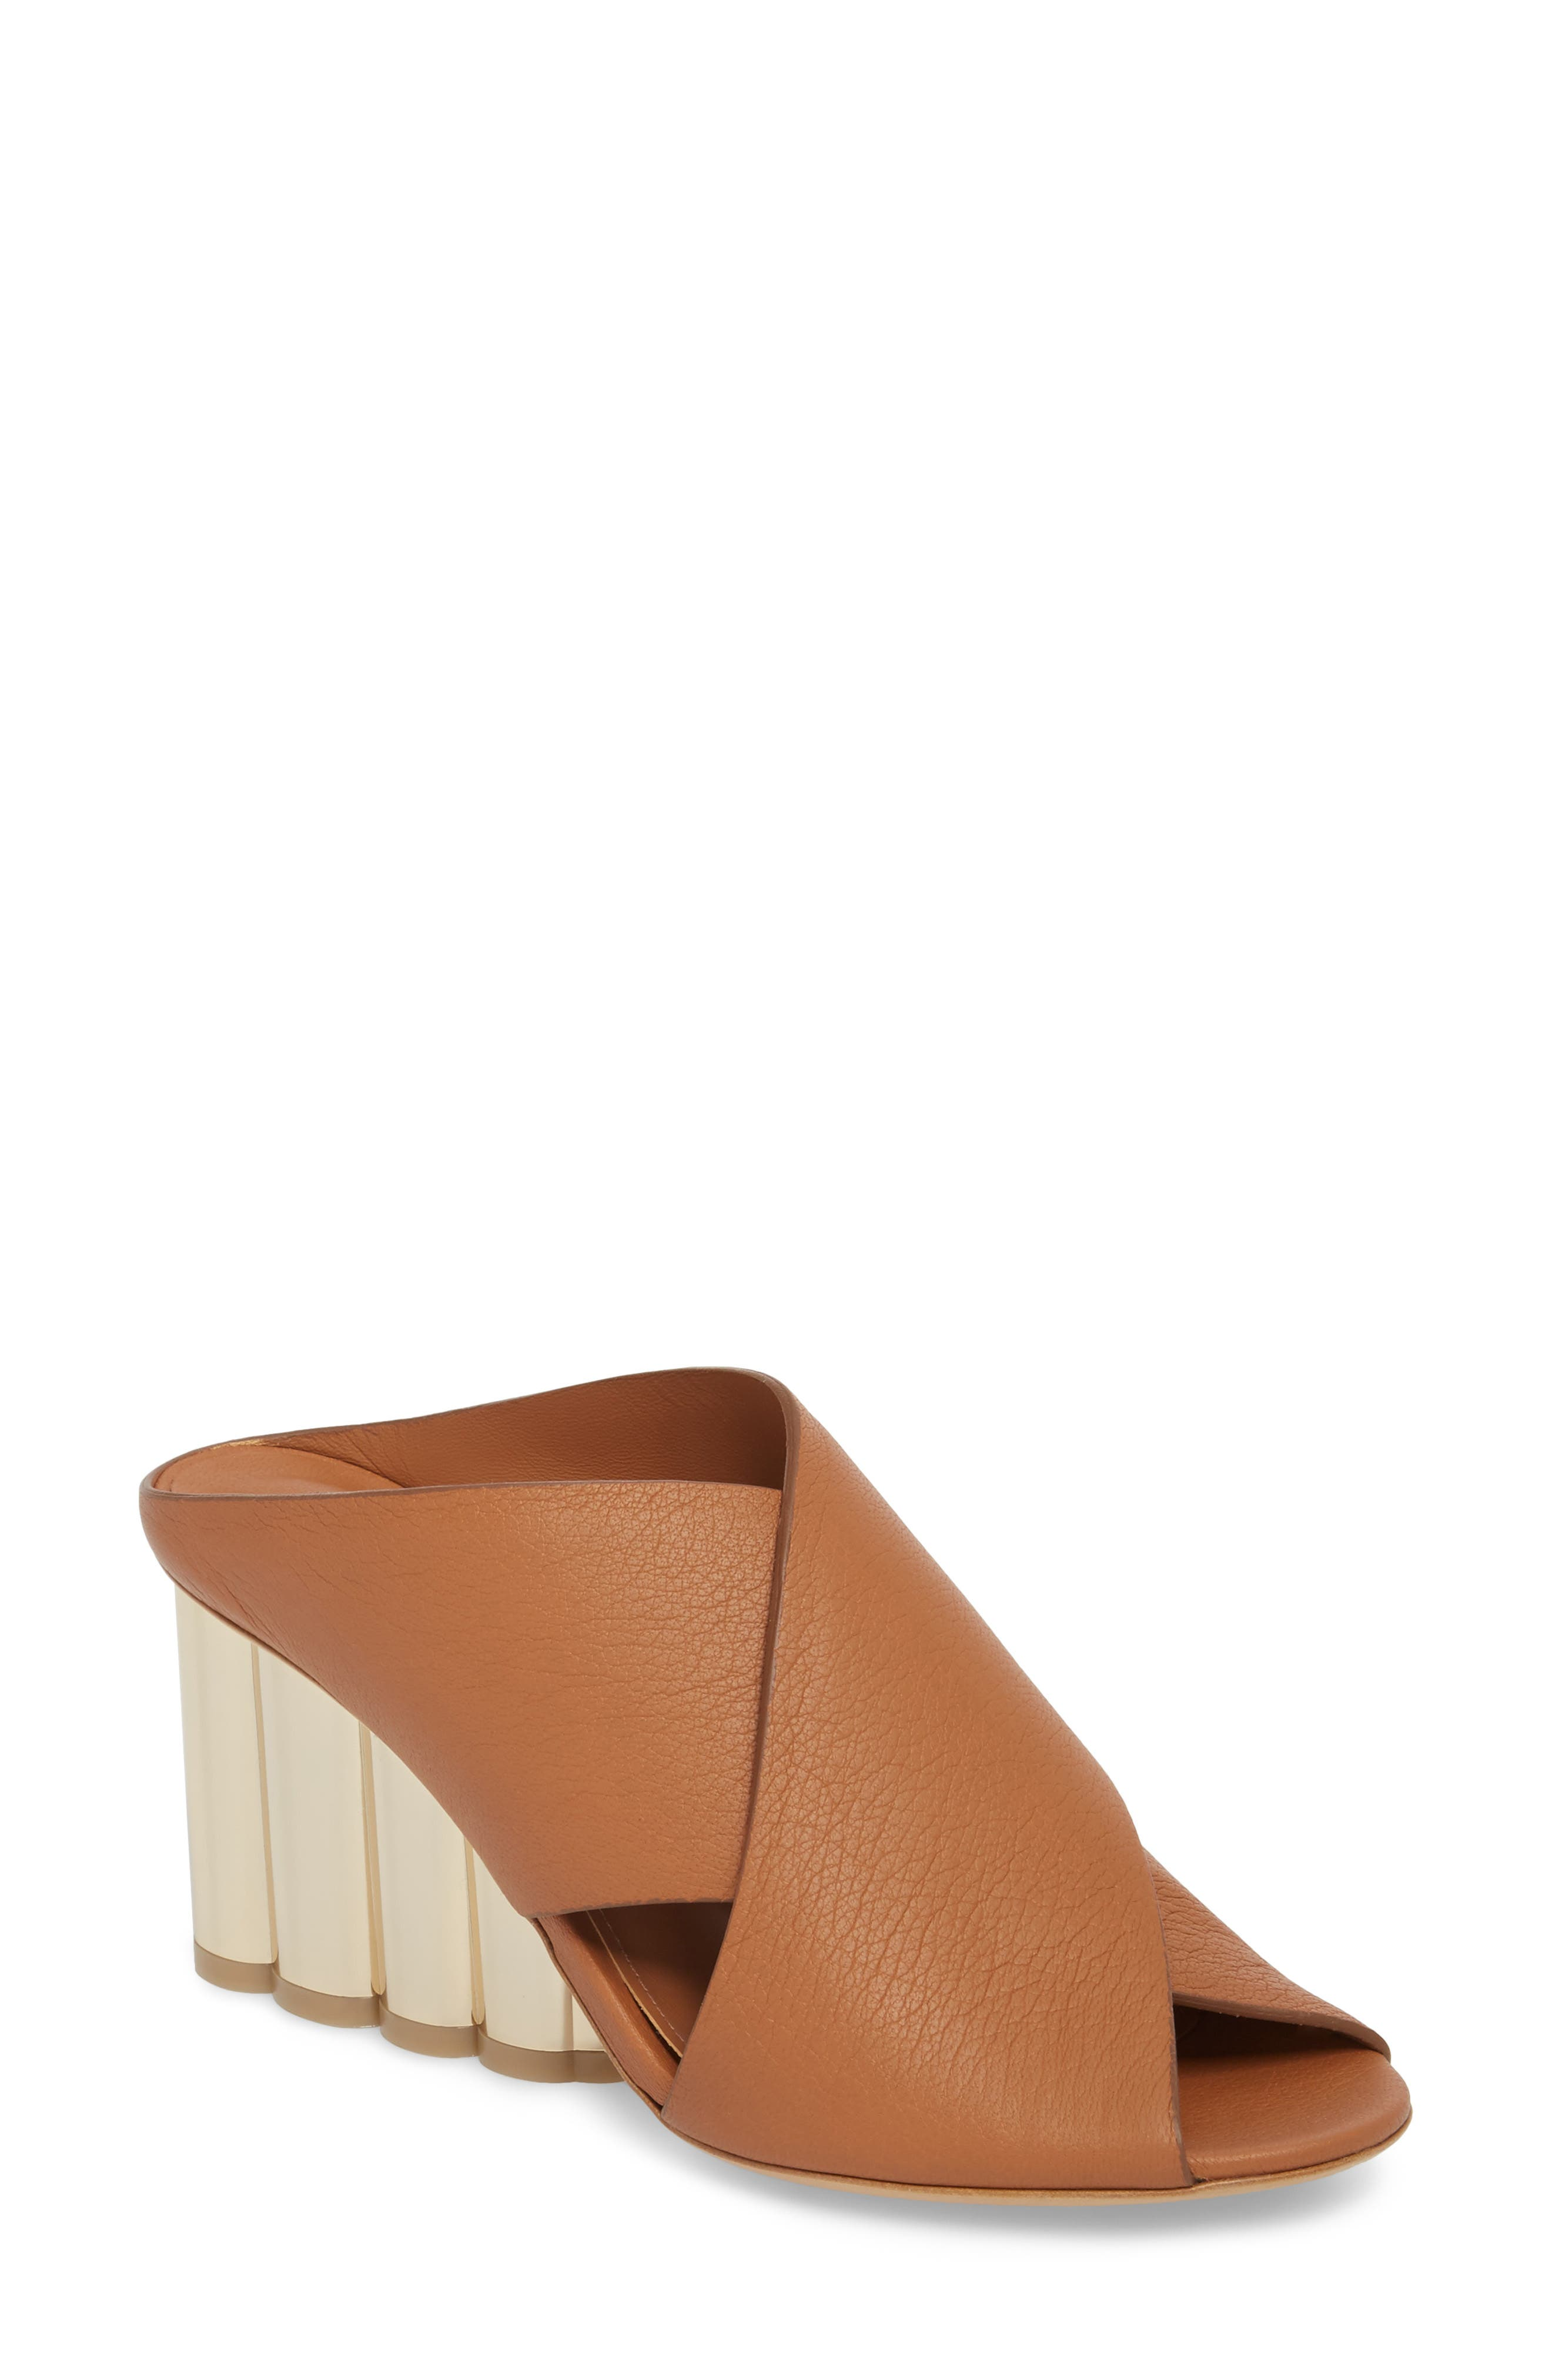 Salvatore Ferragamo Lasa Cross Strap Mule Sandal (Women)